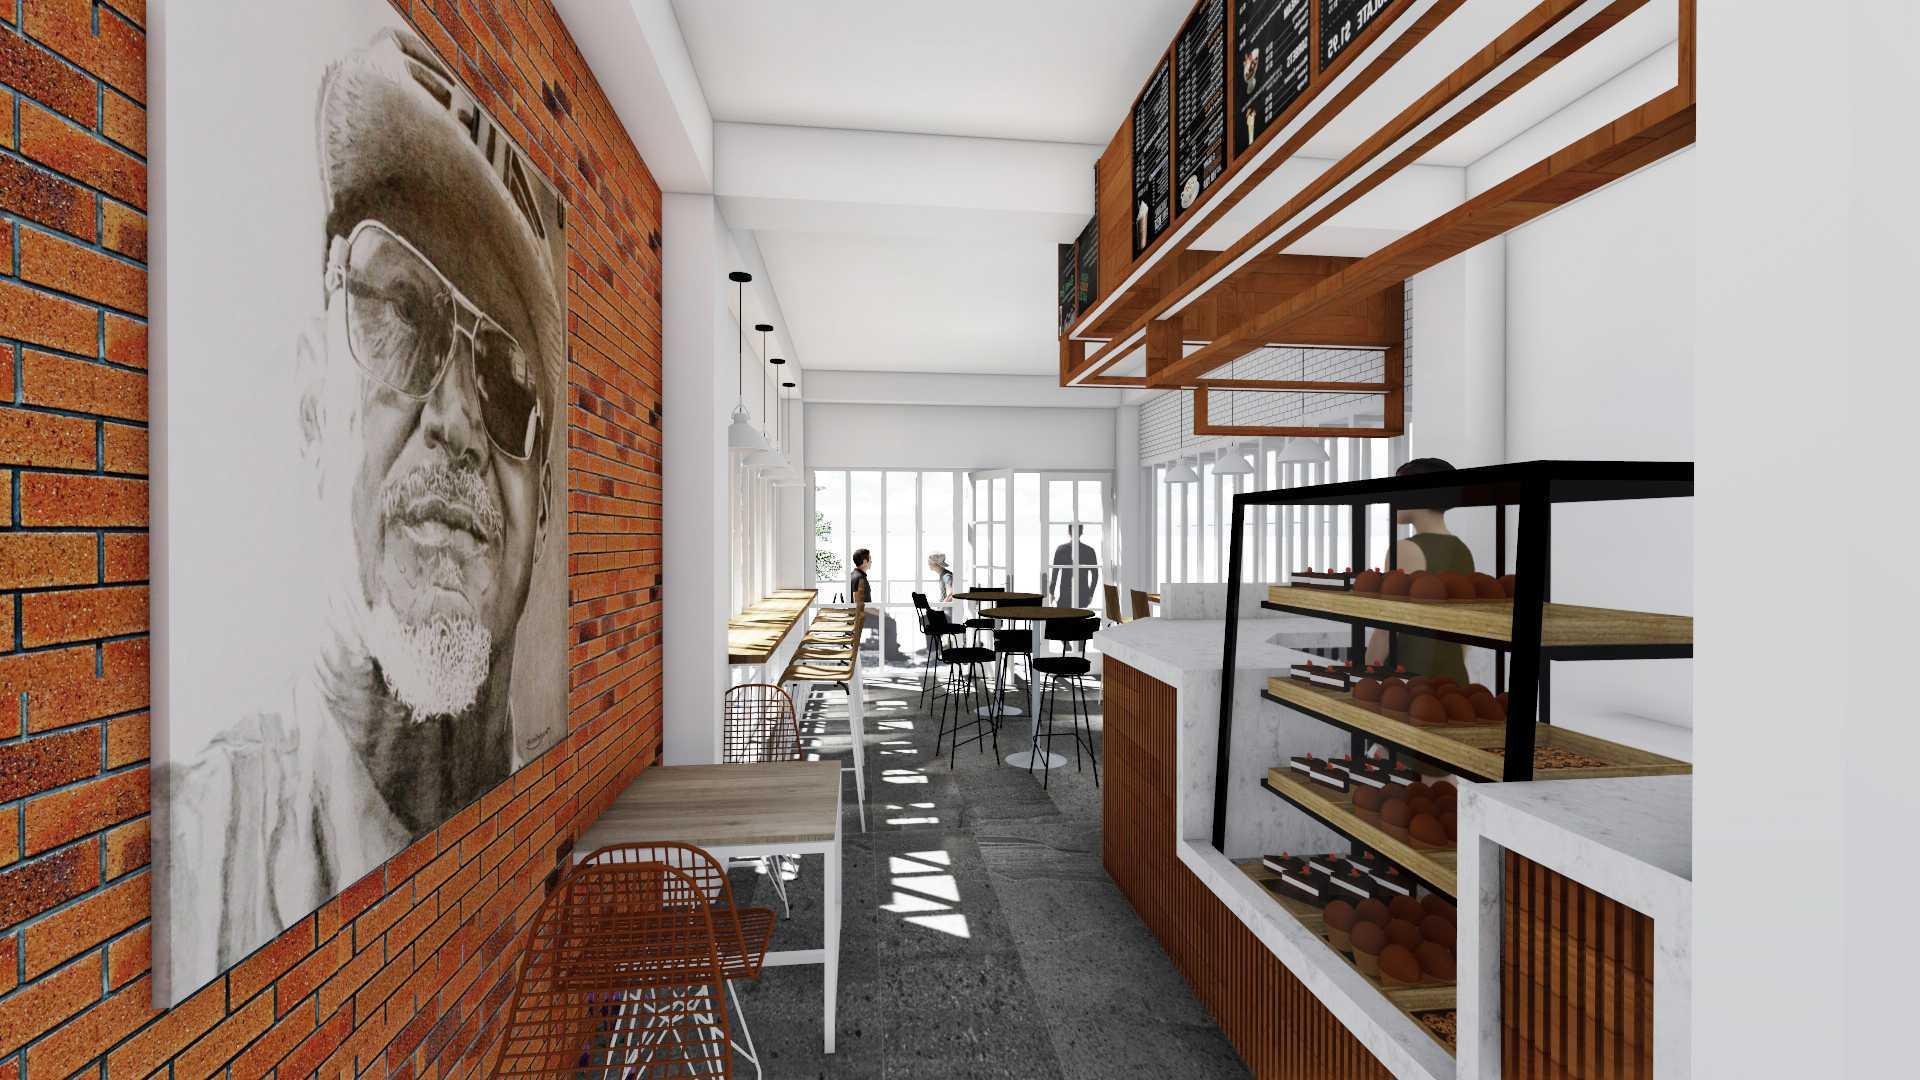 Astabumi Studio Institut Kopi Tegal Tegal, Kota Tegal, Jawa Tengah, Indonesia Tegal, Kota Tegal, Jawa Tengah, Indonesia Astabumi-Architect-Interior-Design-Institut-Kopi-Tegal  83520